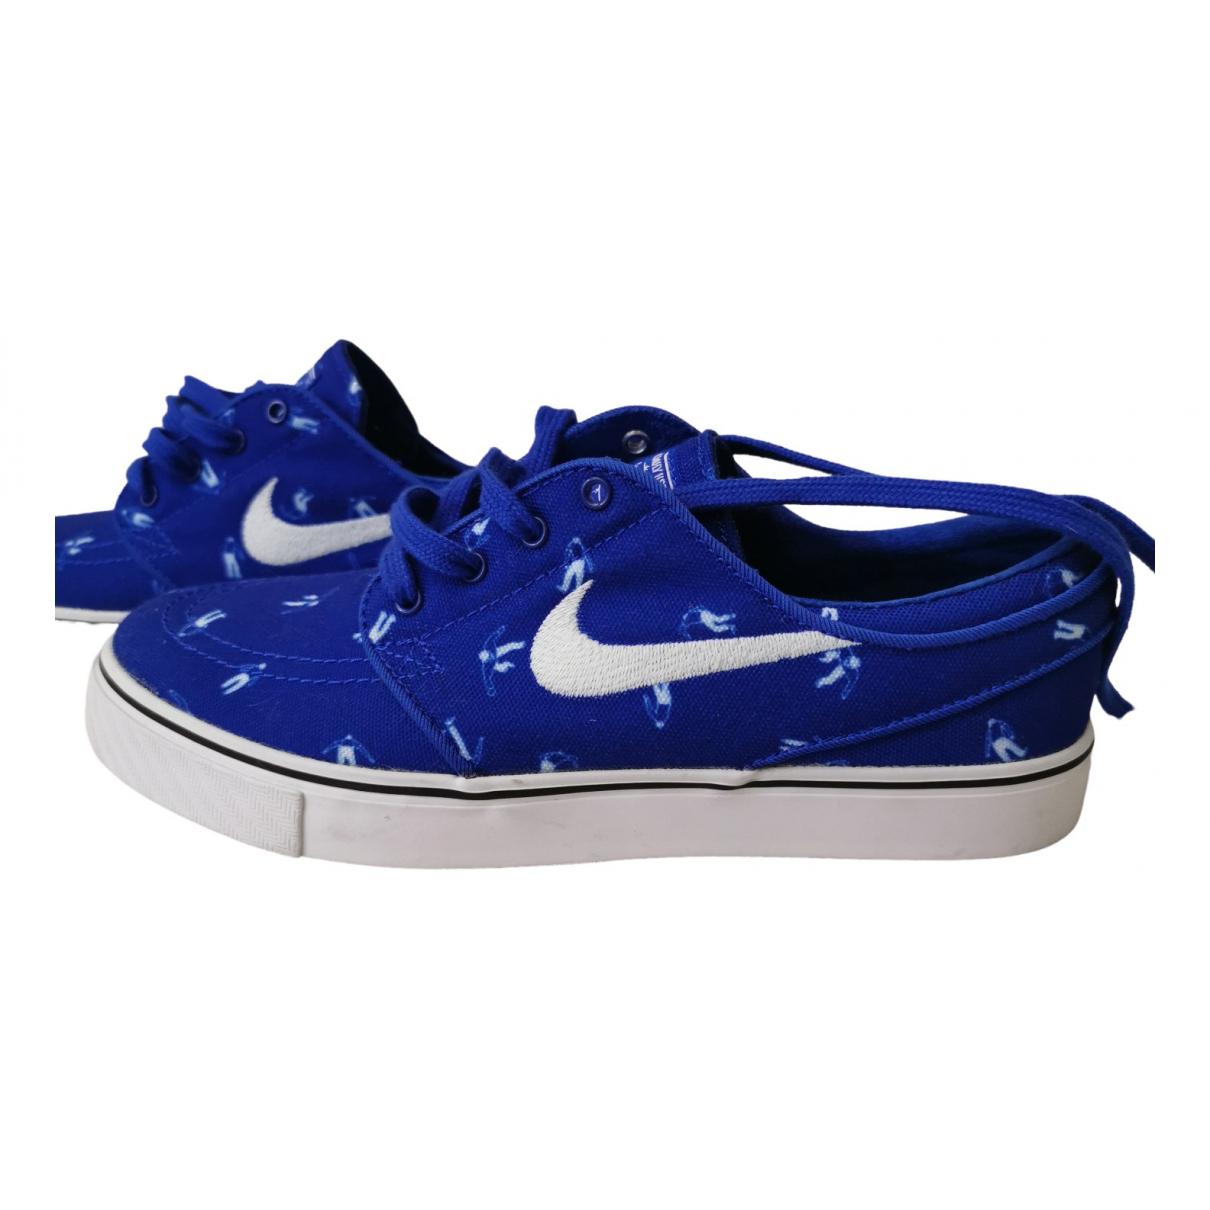 Nike - Baskets Zoom pour homme en toile - bleu